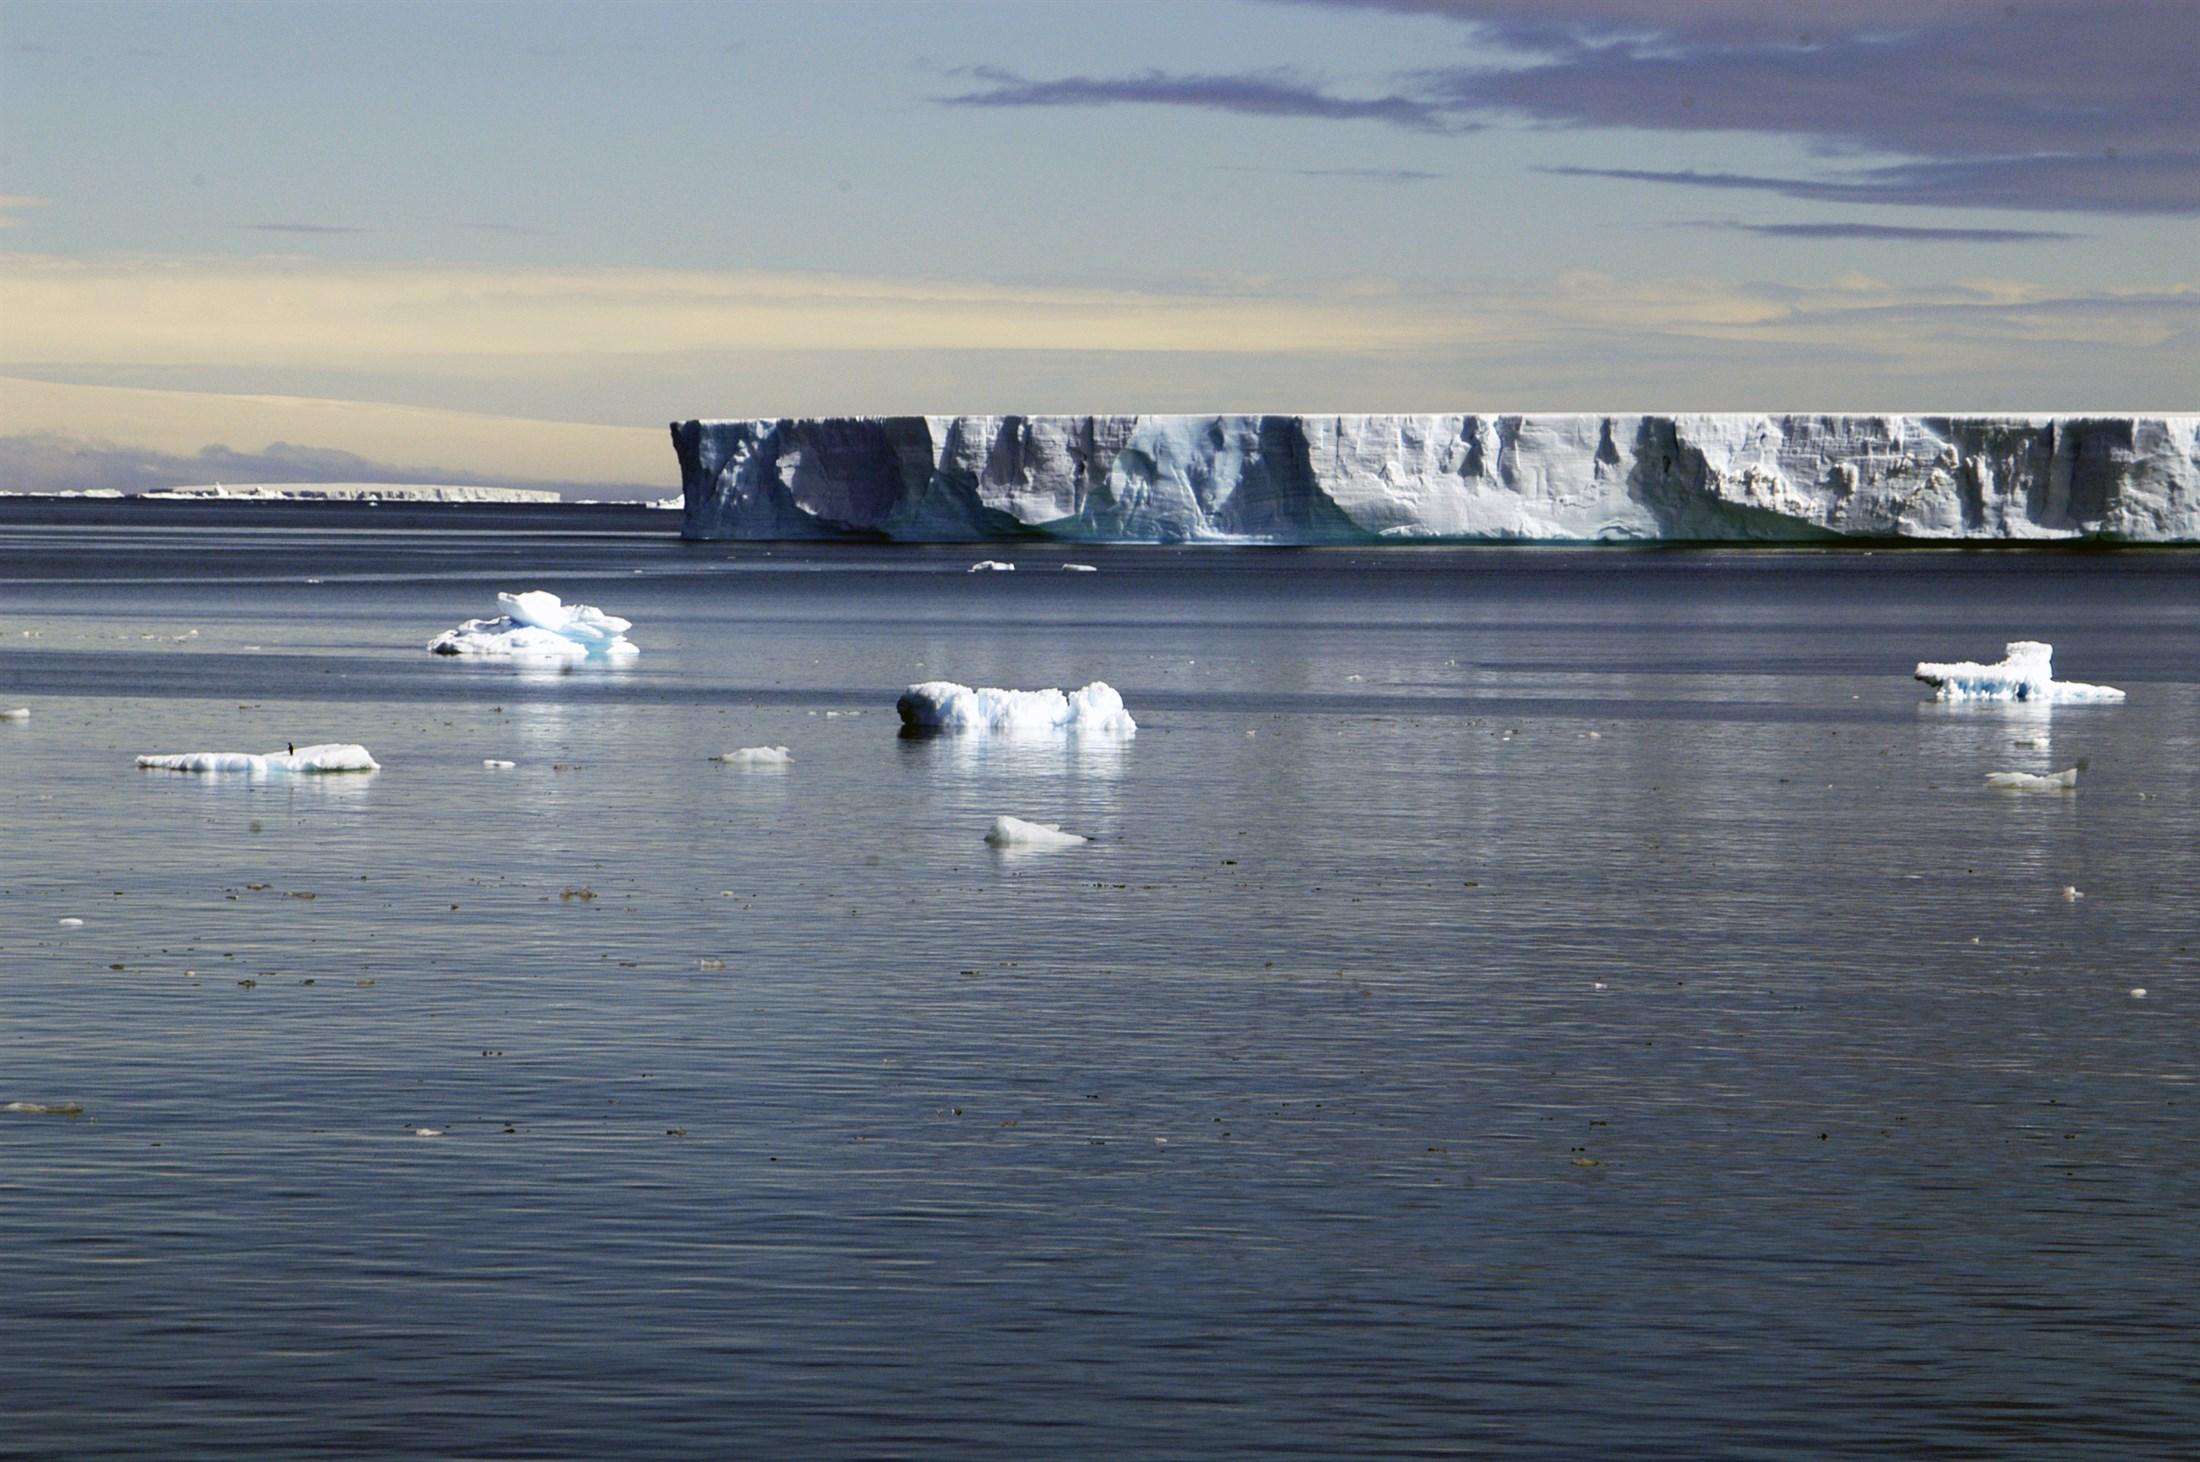 shelf-iceberg-antarctic-peninsula_ab8f-2200x1462px